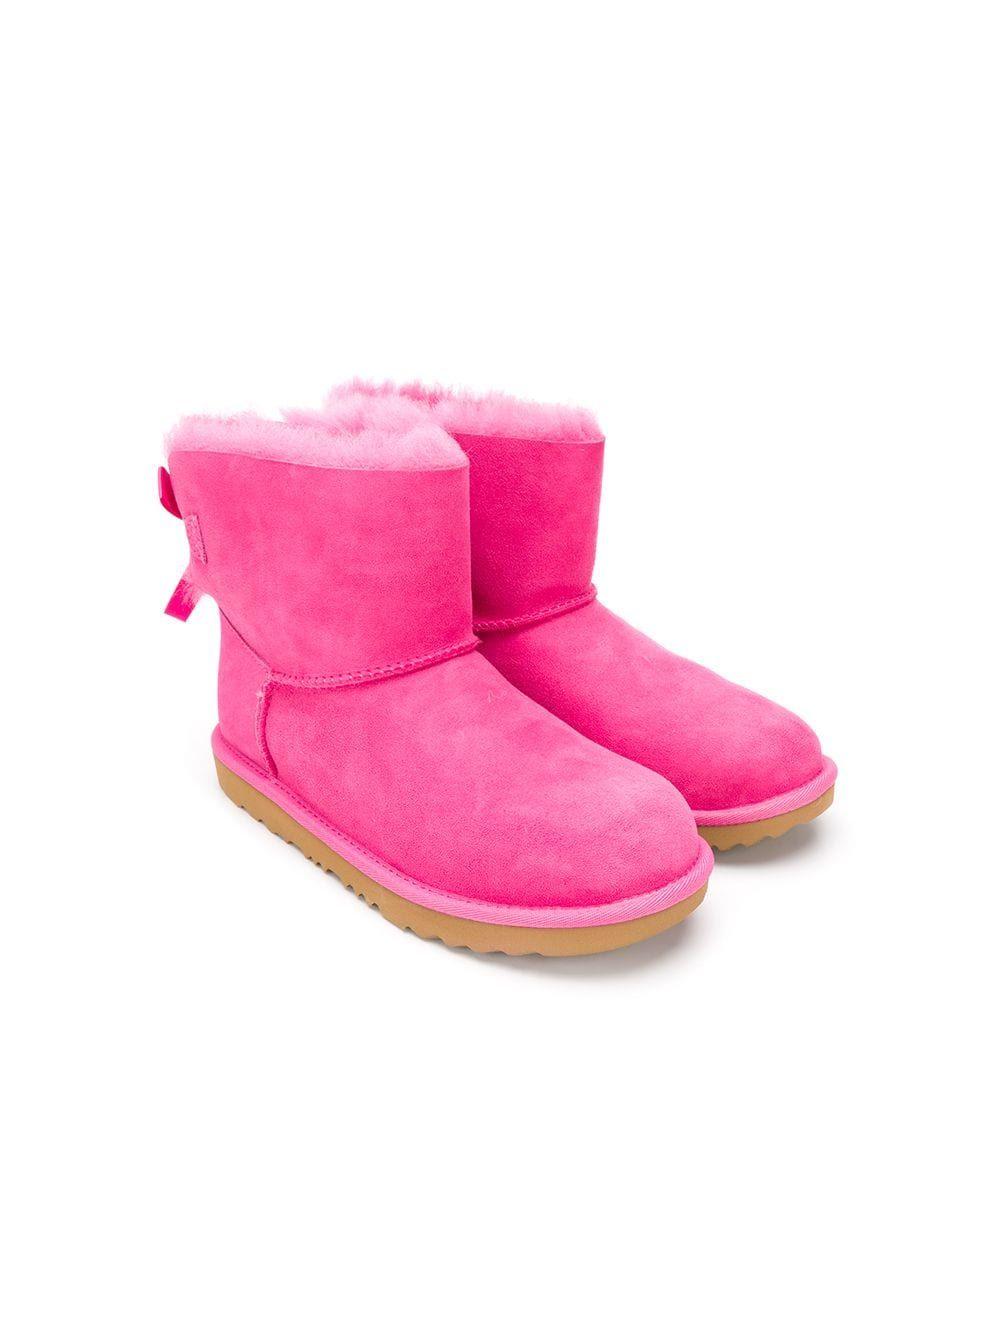 da219223969 Ugg Australia Kids TEEN mini Bailey bow II boots - Pink in 2019 ...